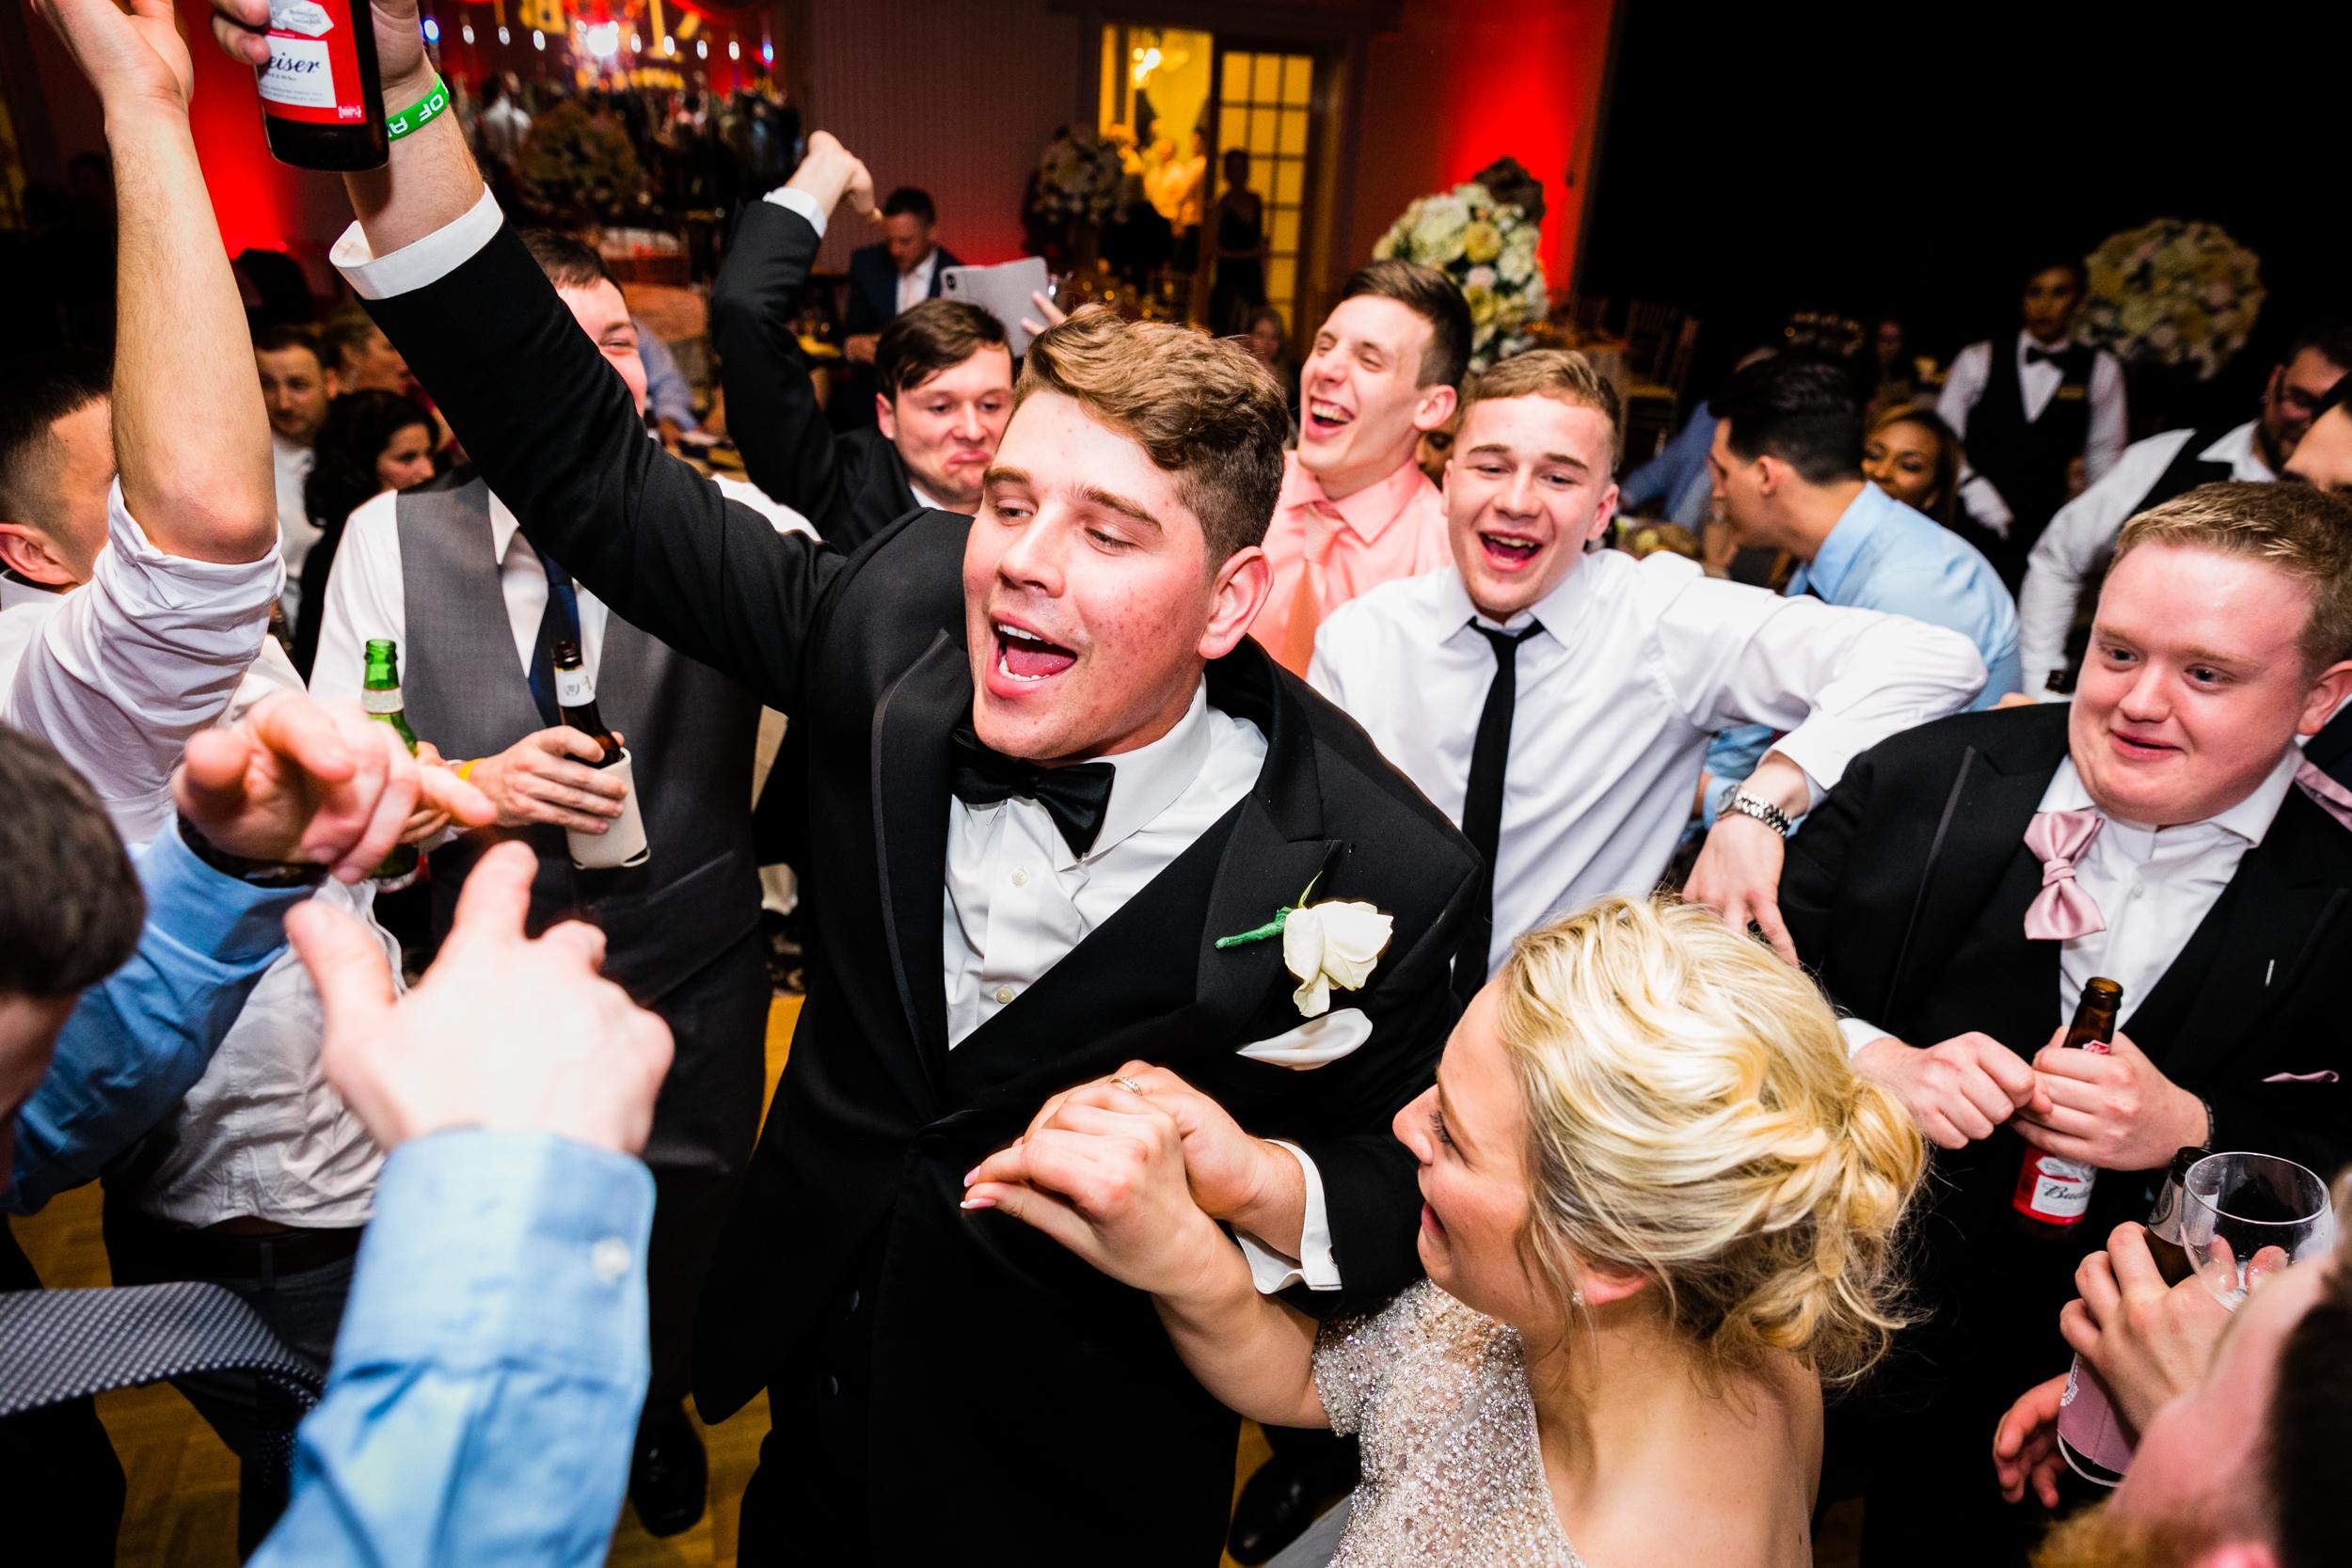 CELEBRATIONS BENSALEM WEDDING PHOTOGRAPHY-121.jpg